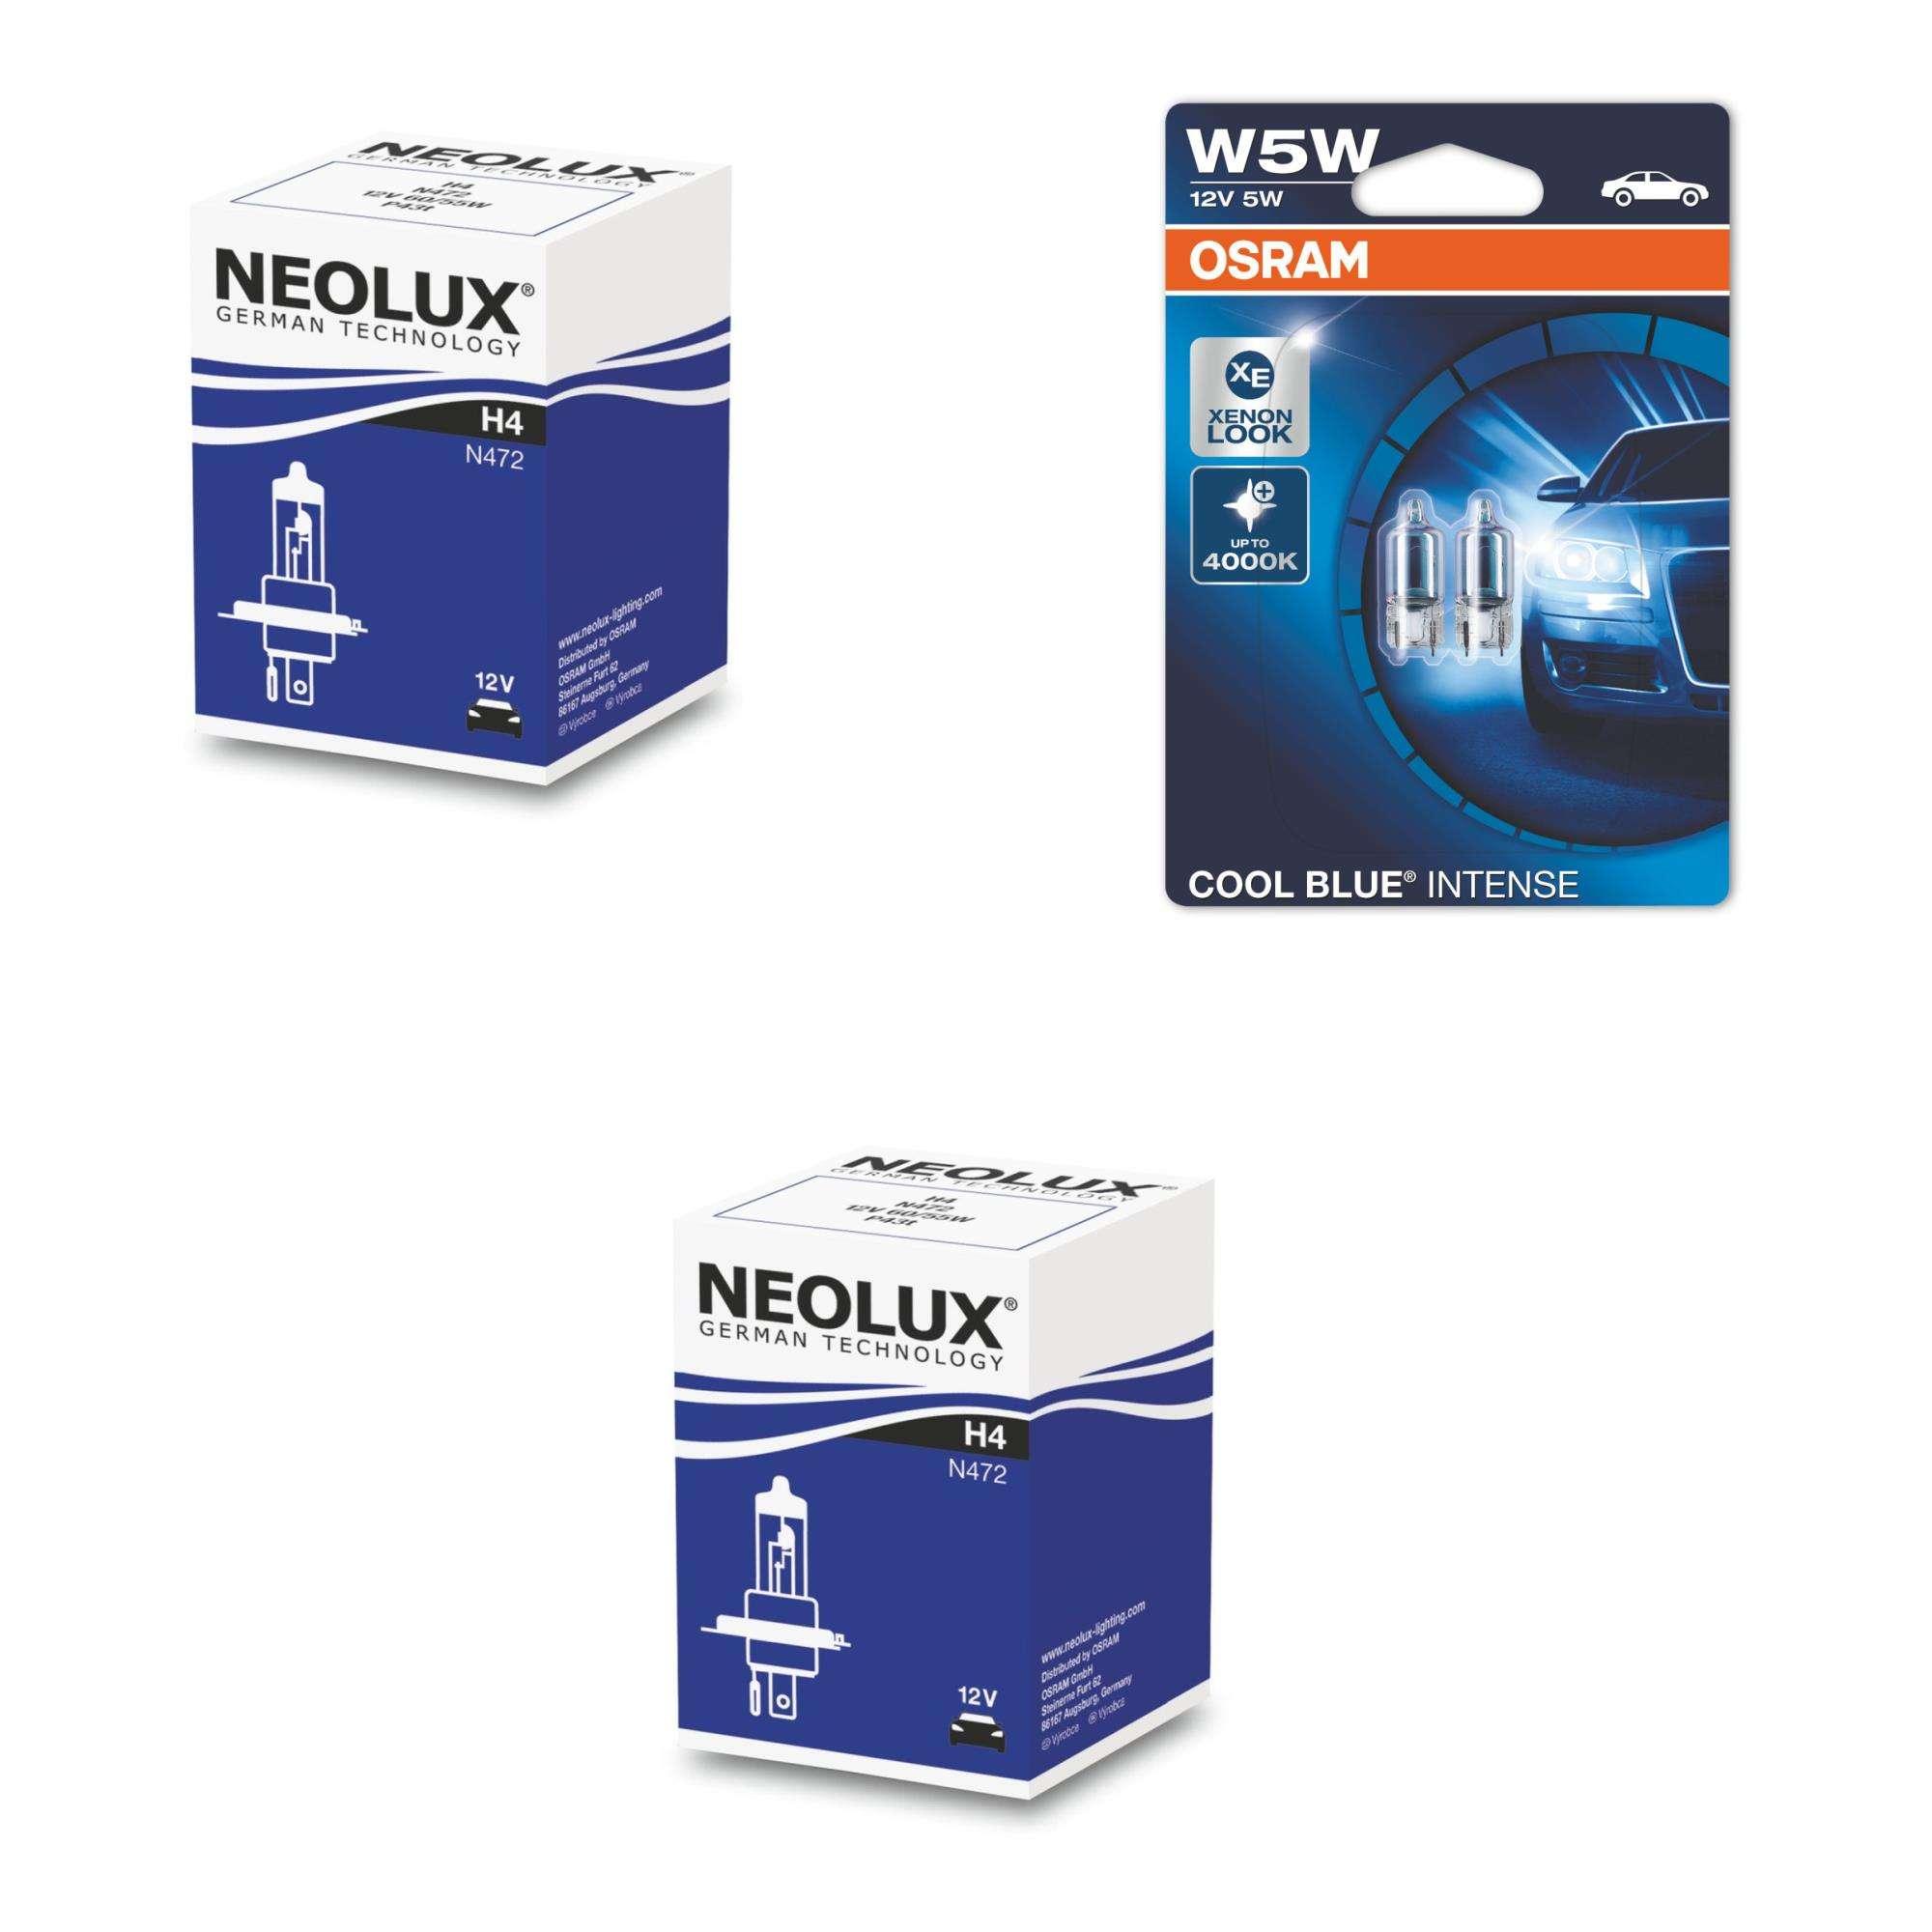 H4-12V-60-55W-Standard-Erstausruesterqualitaet-2St-NeoLux-W5W-Cool-Blue-Intense